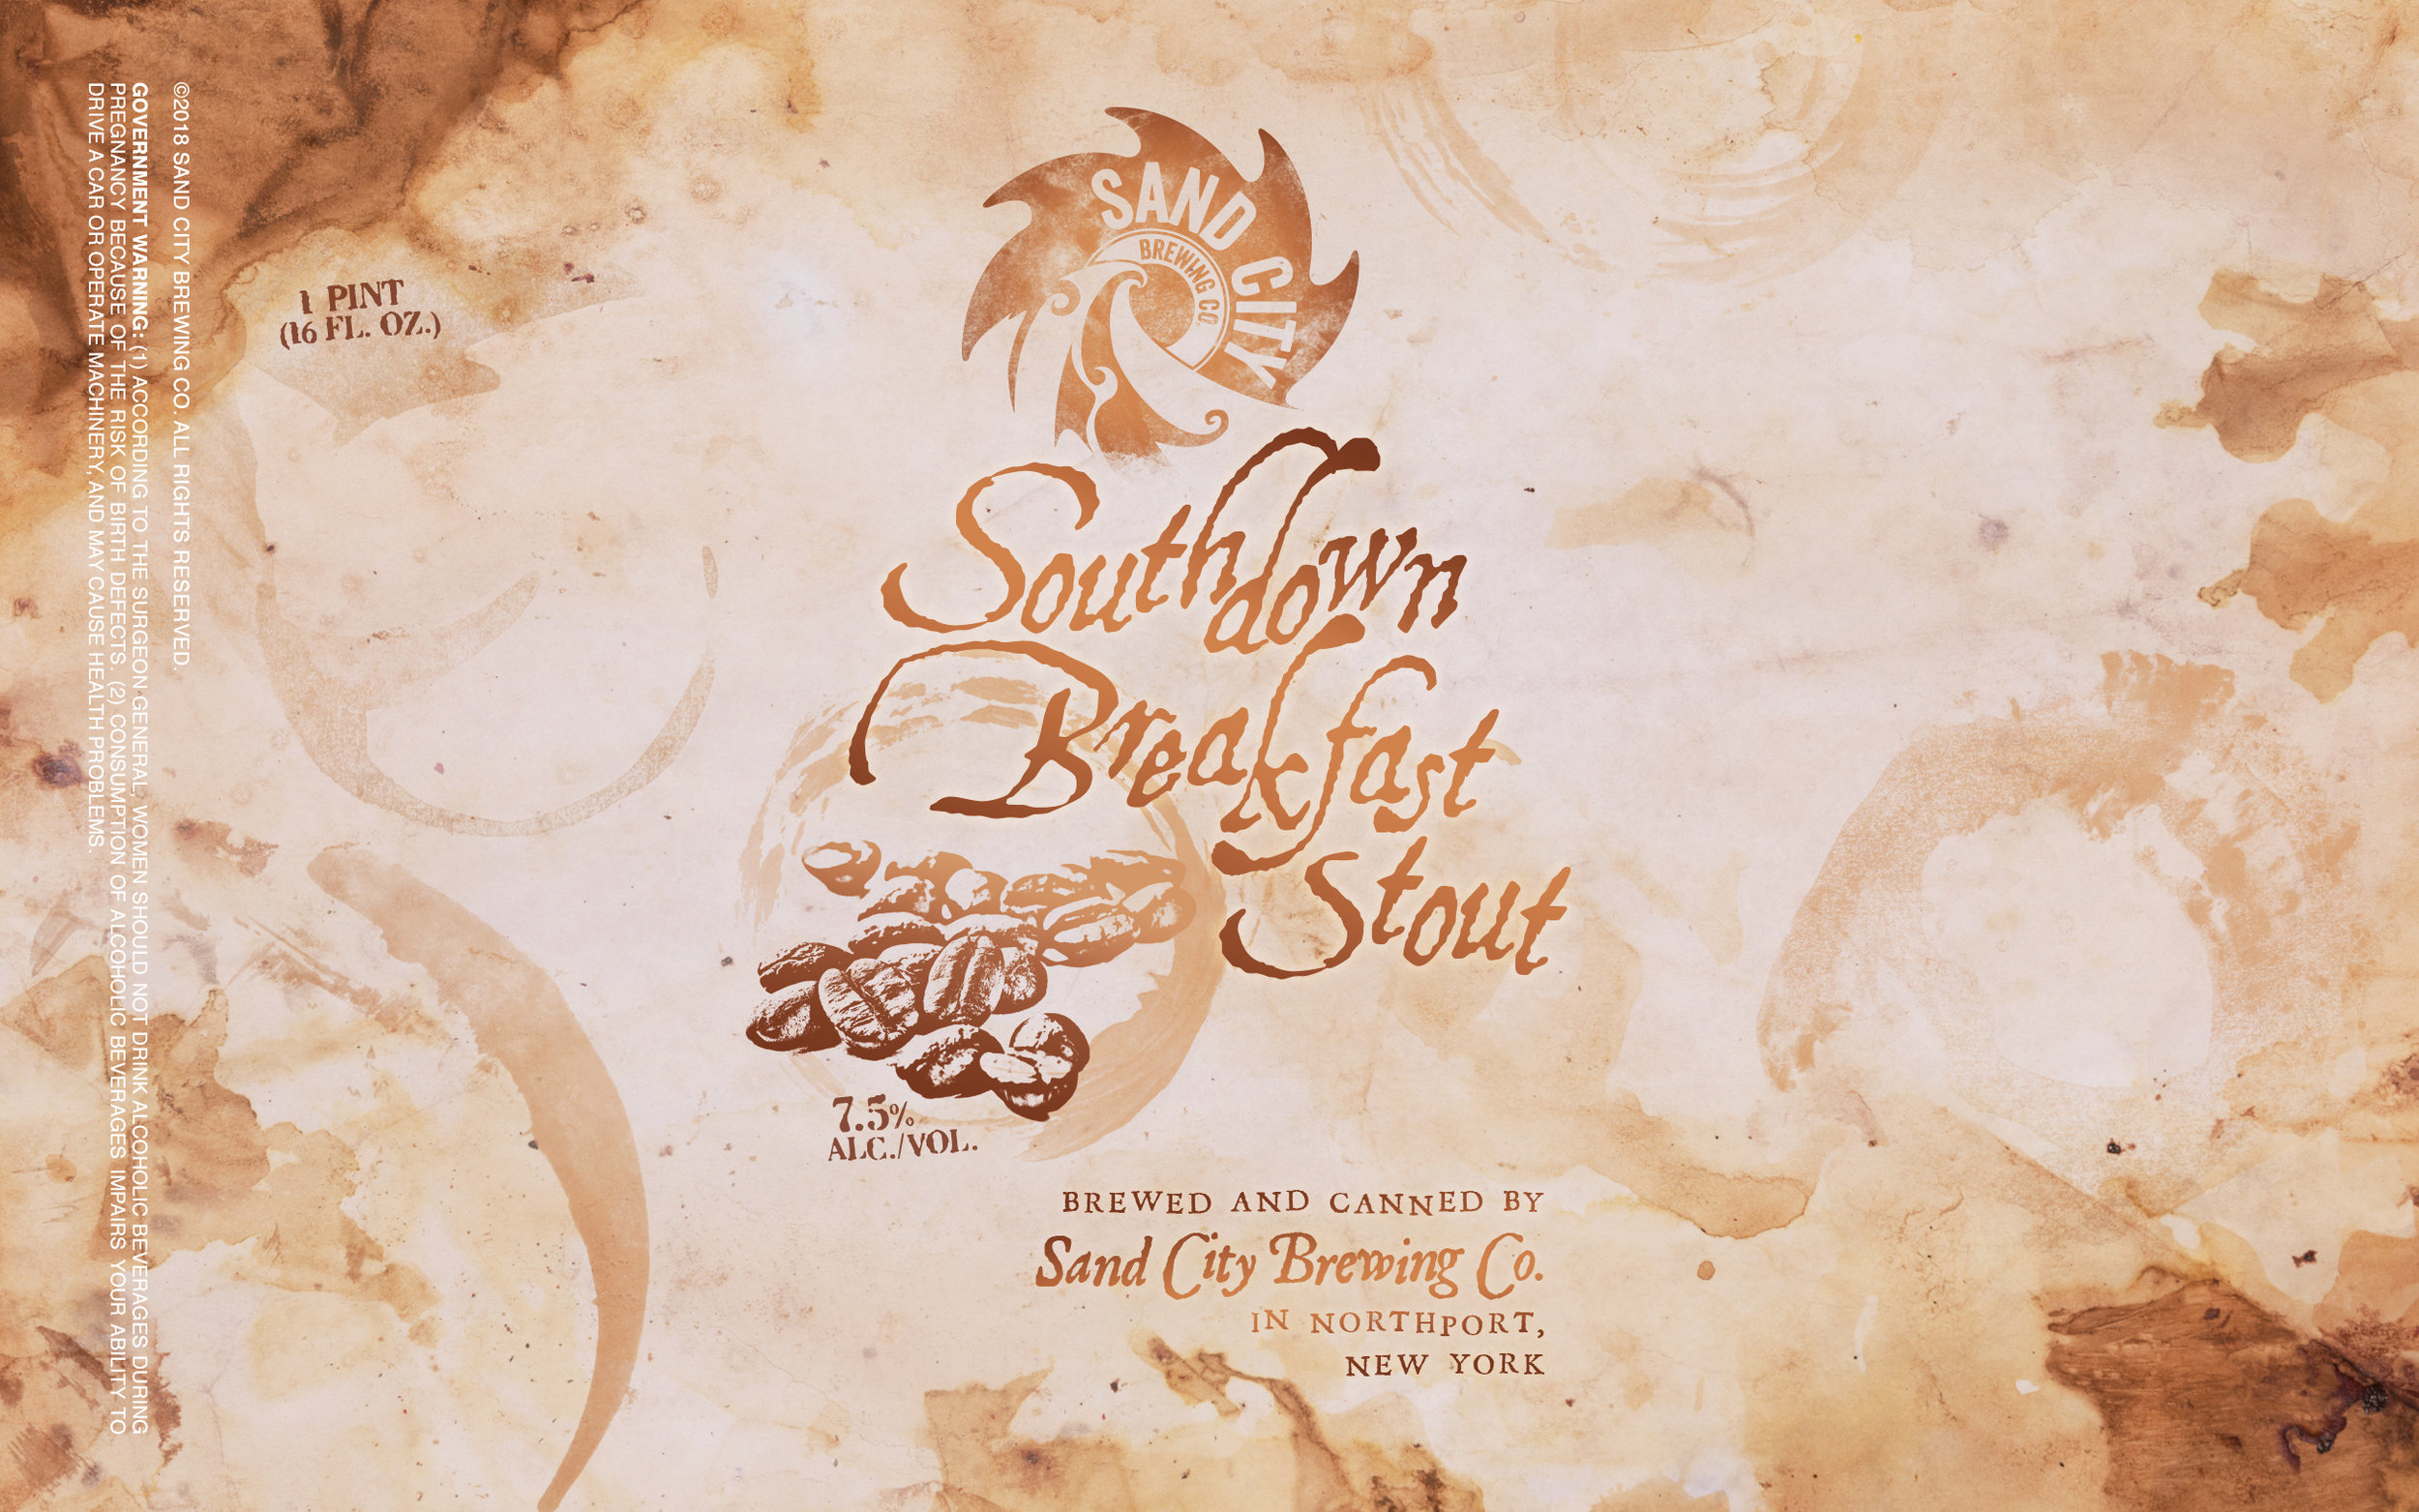 Southdown Breakfast Stout 16oz can label - FINAL FLAT - 12-6-2017.JPG